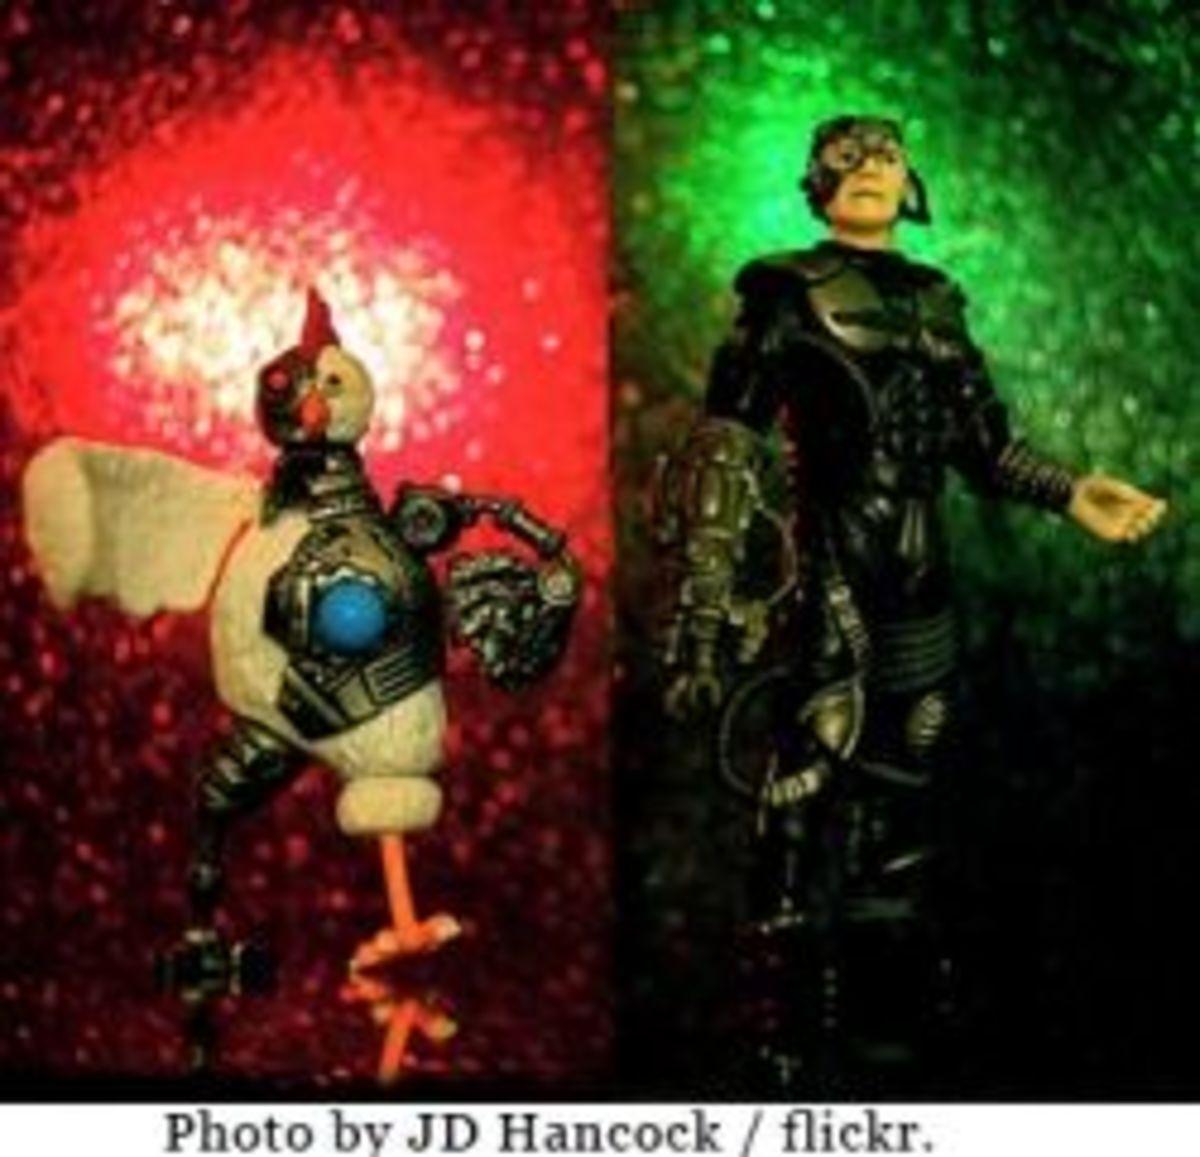 robot-chicken-vs-locutus-of-borg